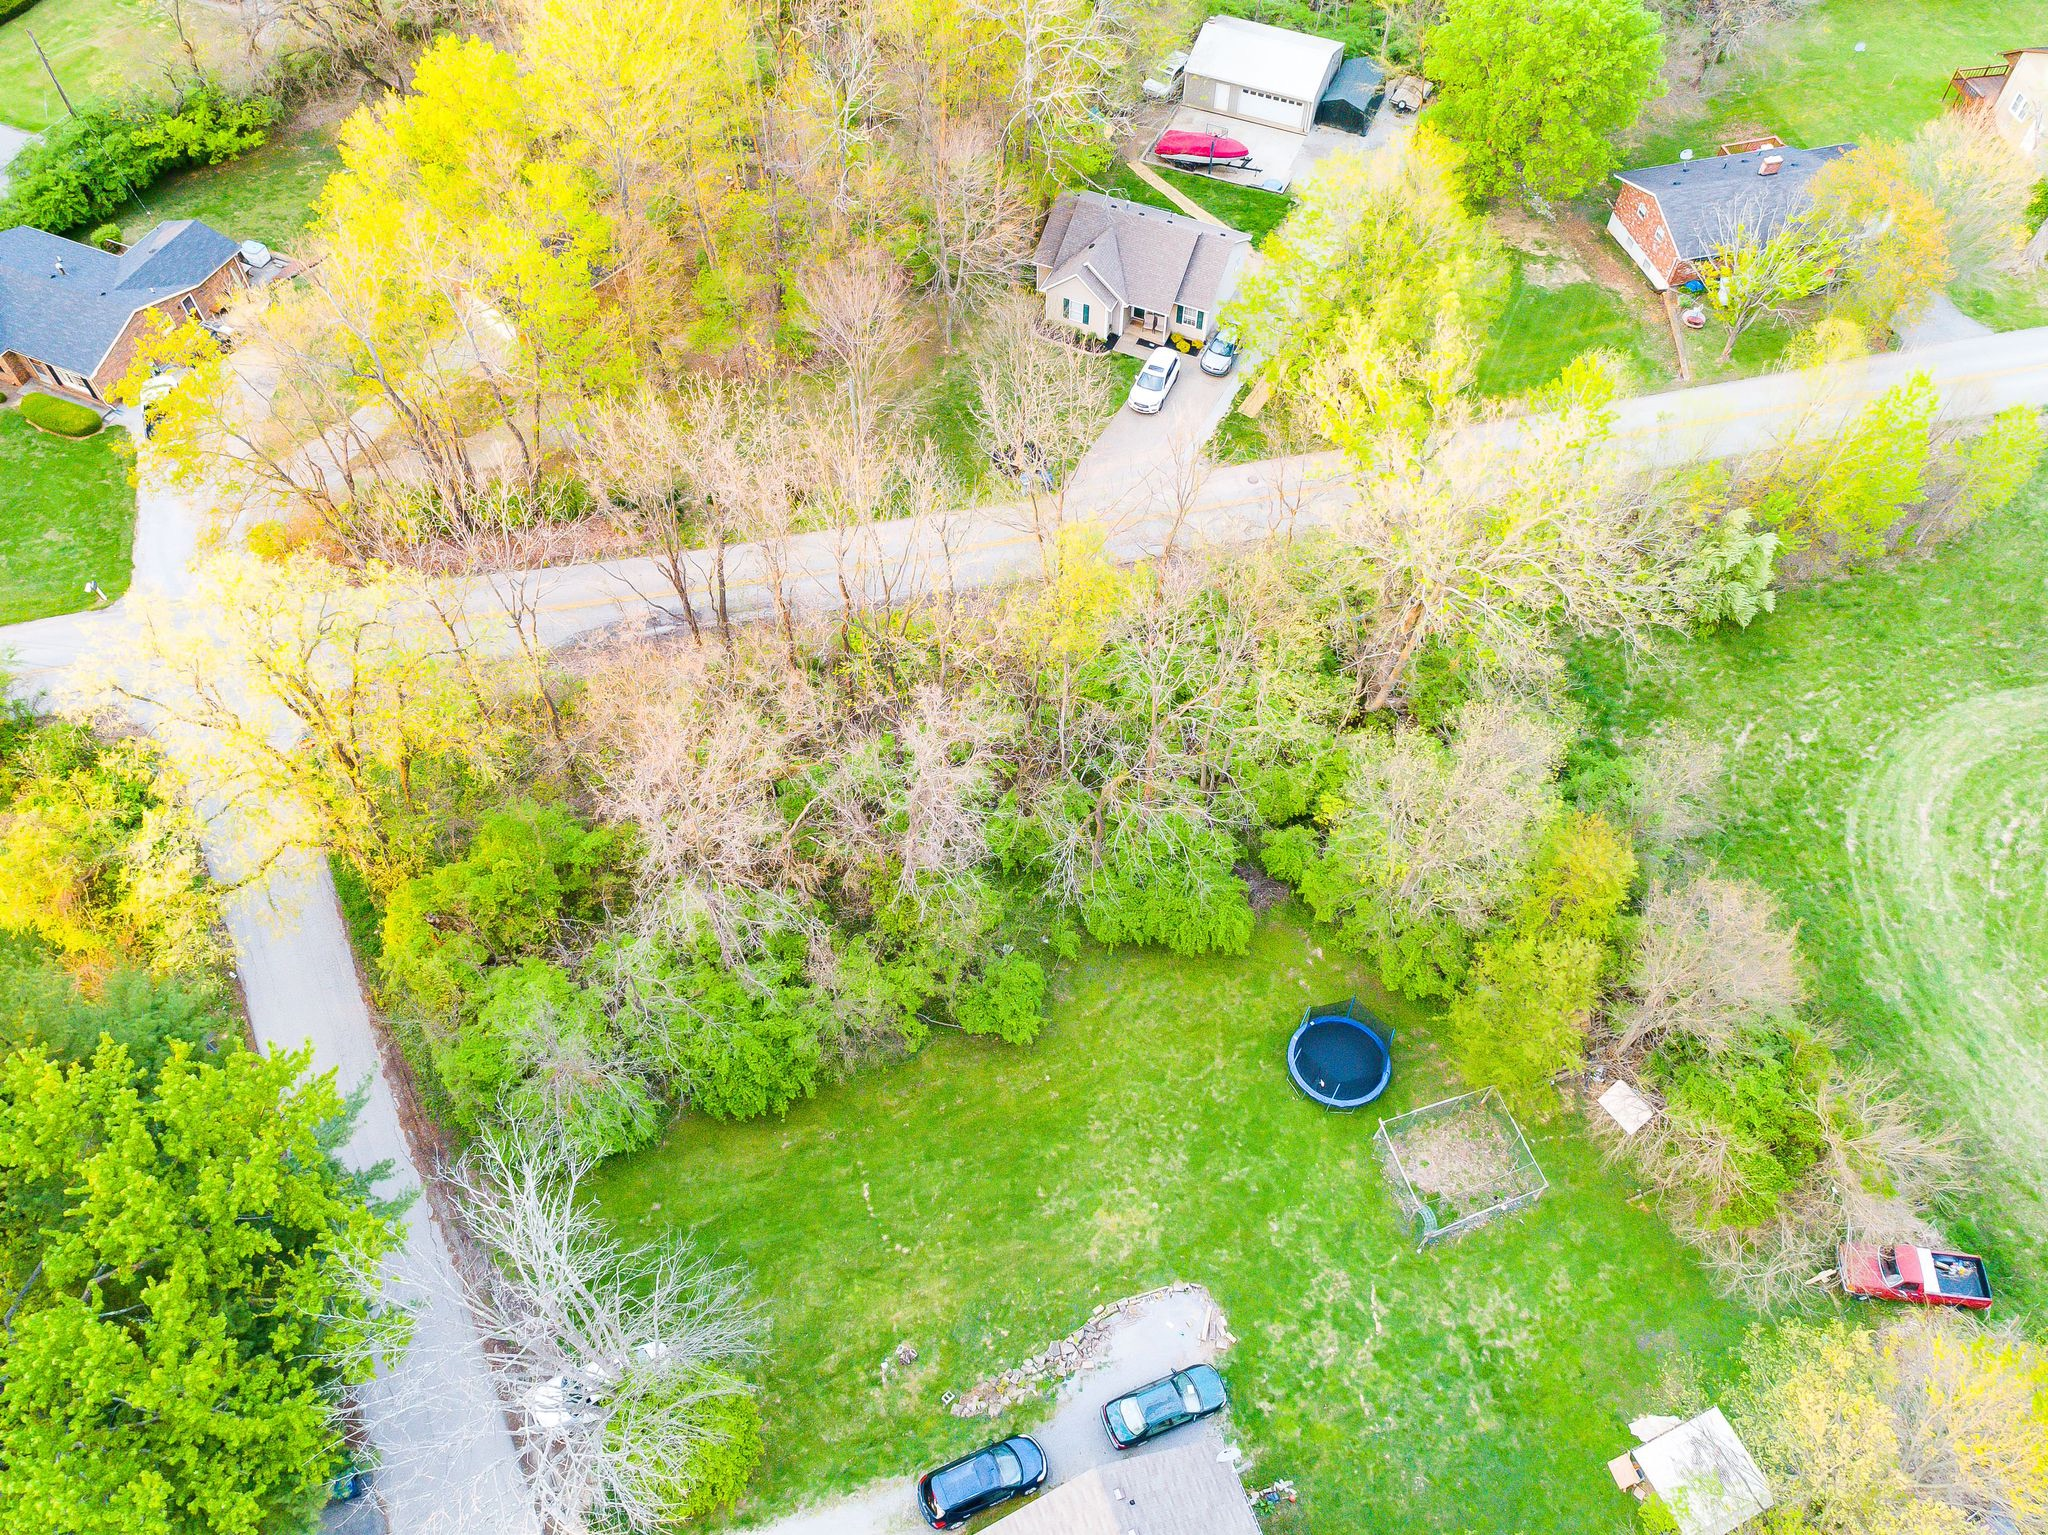 Lot 10 B Franklin Ave (Image - 3)